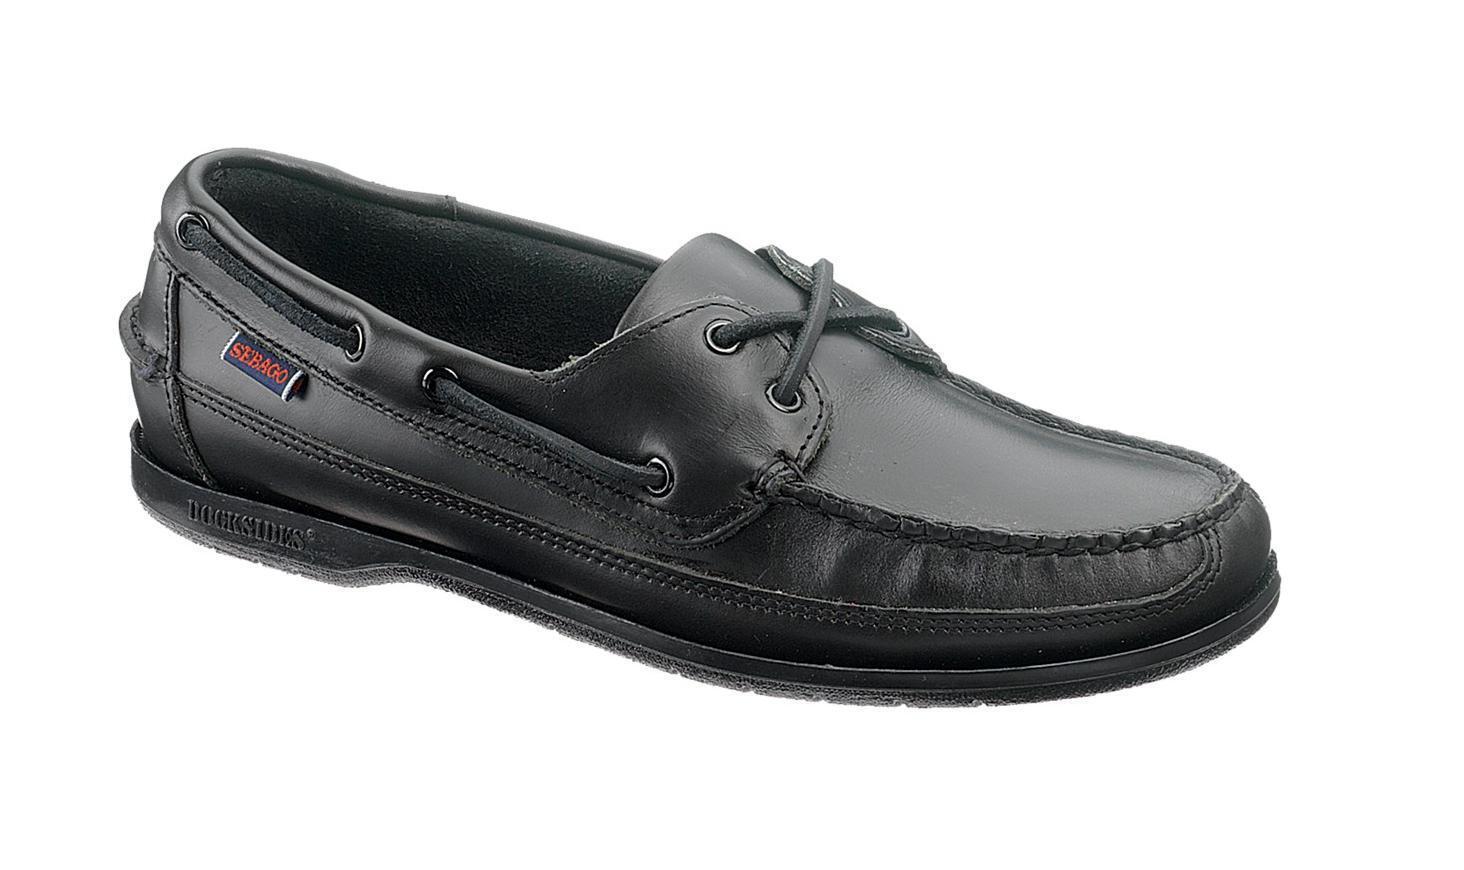 Sebago Schooner Men's Deck Boat Shoe B75942 Black NEW